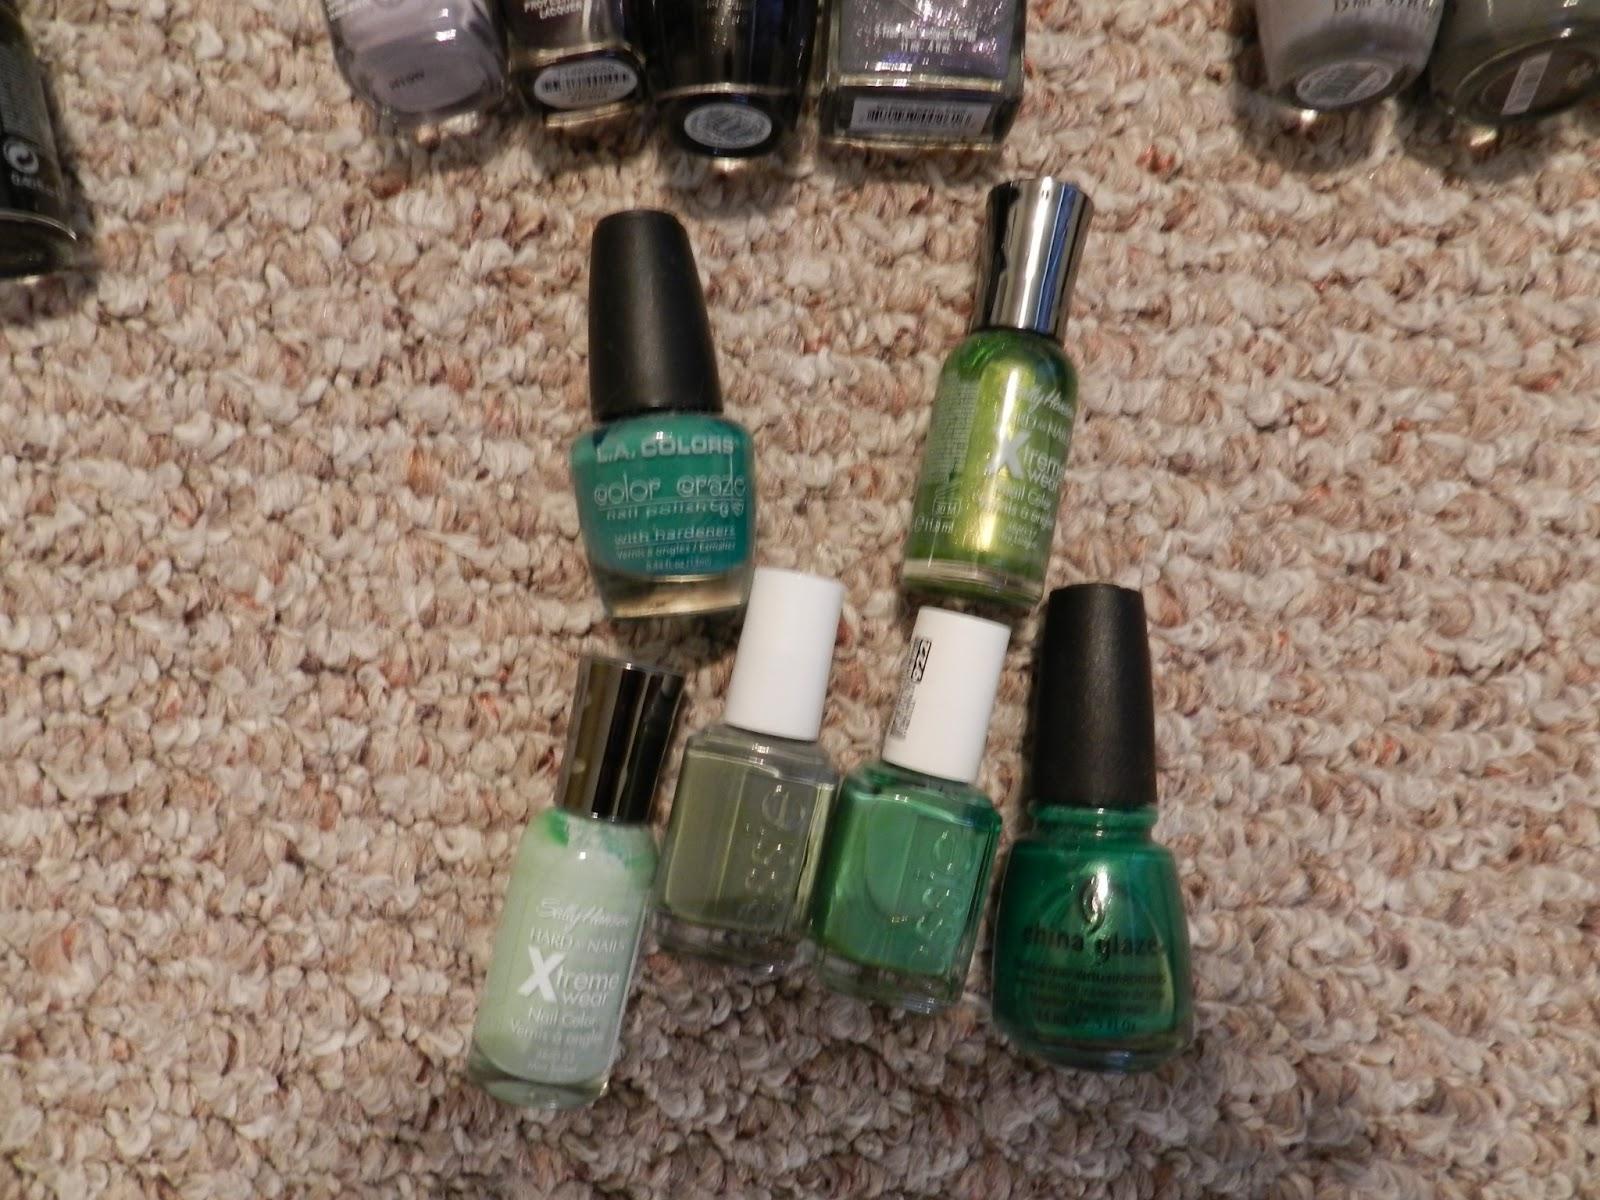 Seemingly Trivial Matters: All of my nail polishes!